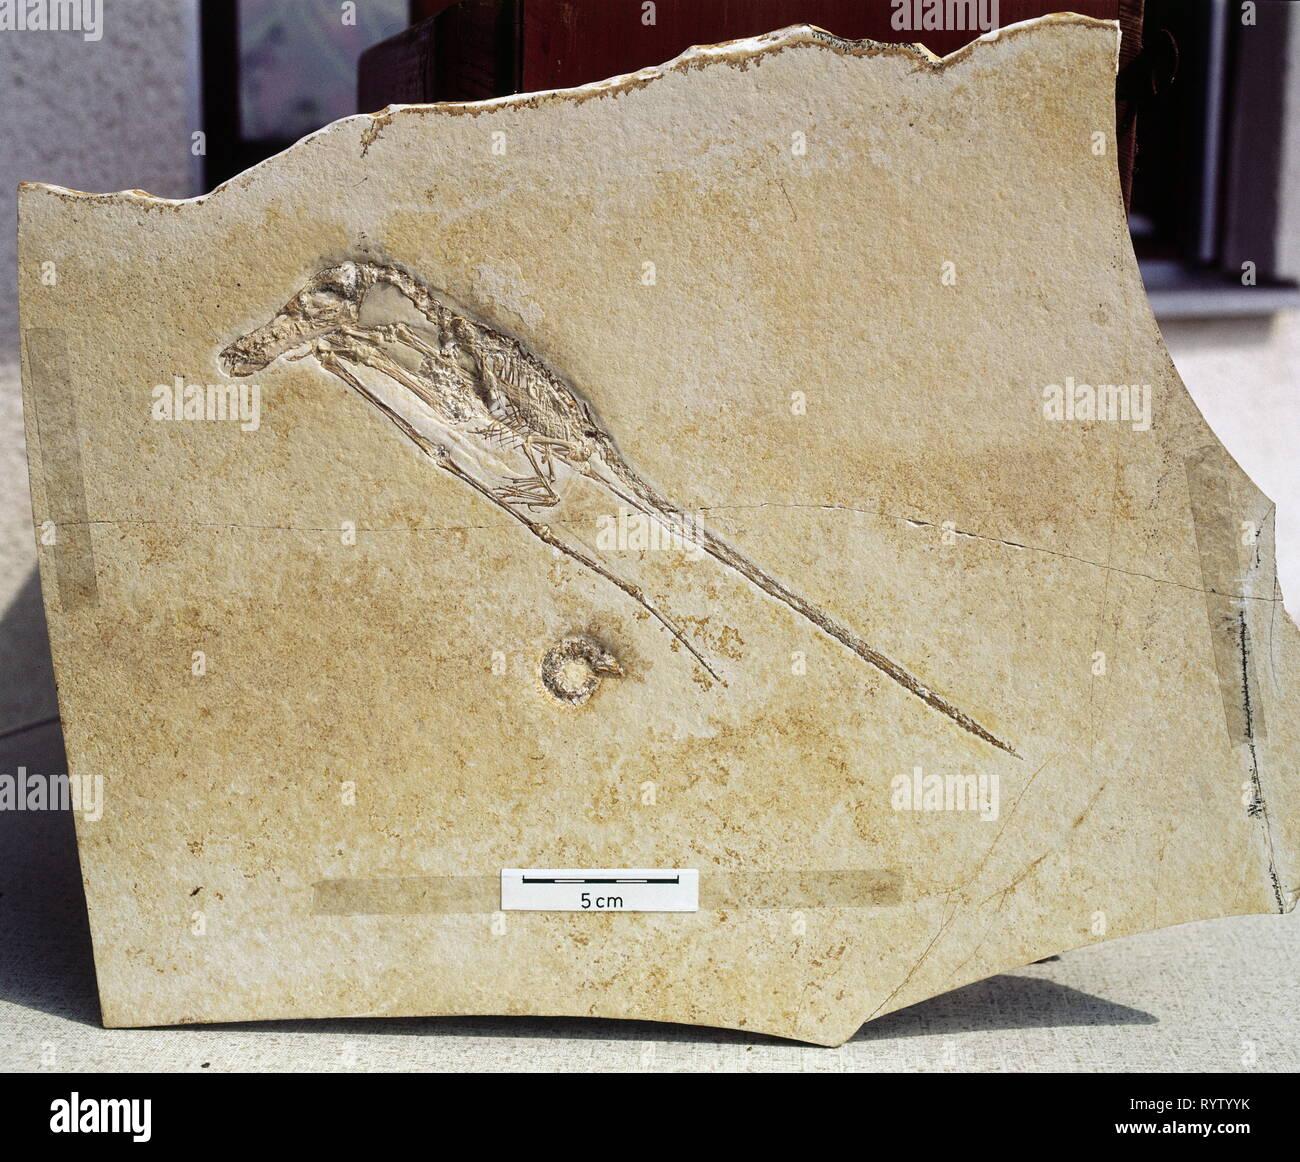 La prehistoria, la fosilización, fósil, zoología, Rhamphorhynchus (Pterosaur), Jurásico Superior, Eichstaedt, Additional-Rights-Clearance-Info-Not-Available Imagen De Stock